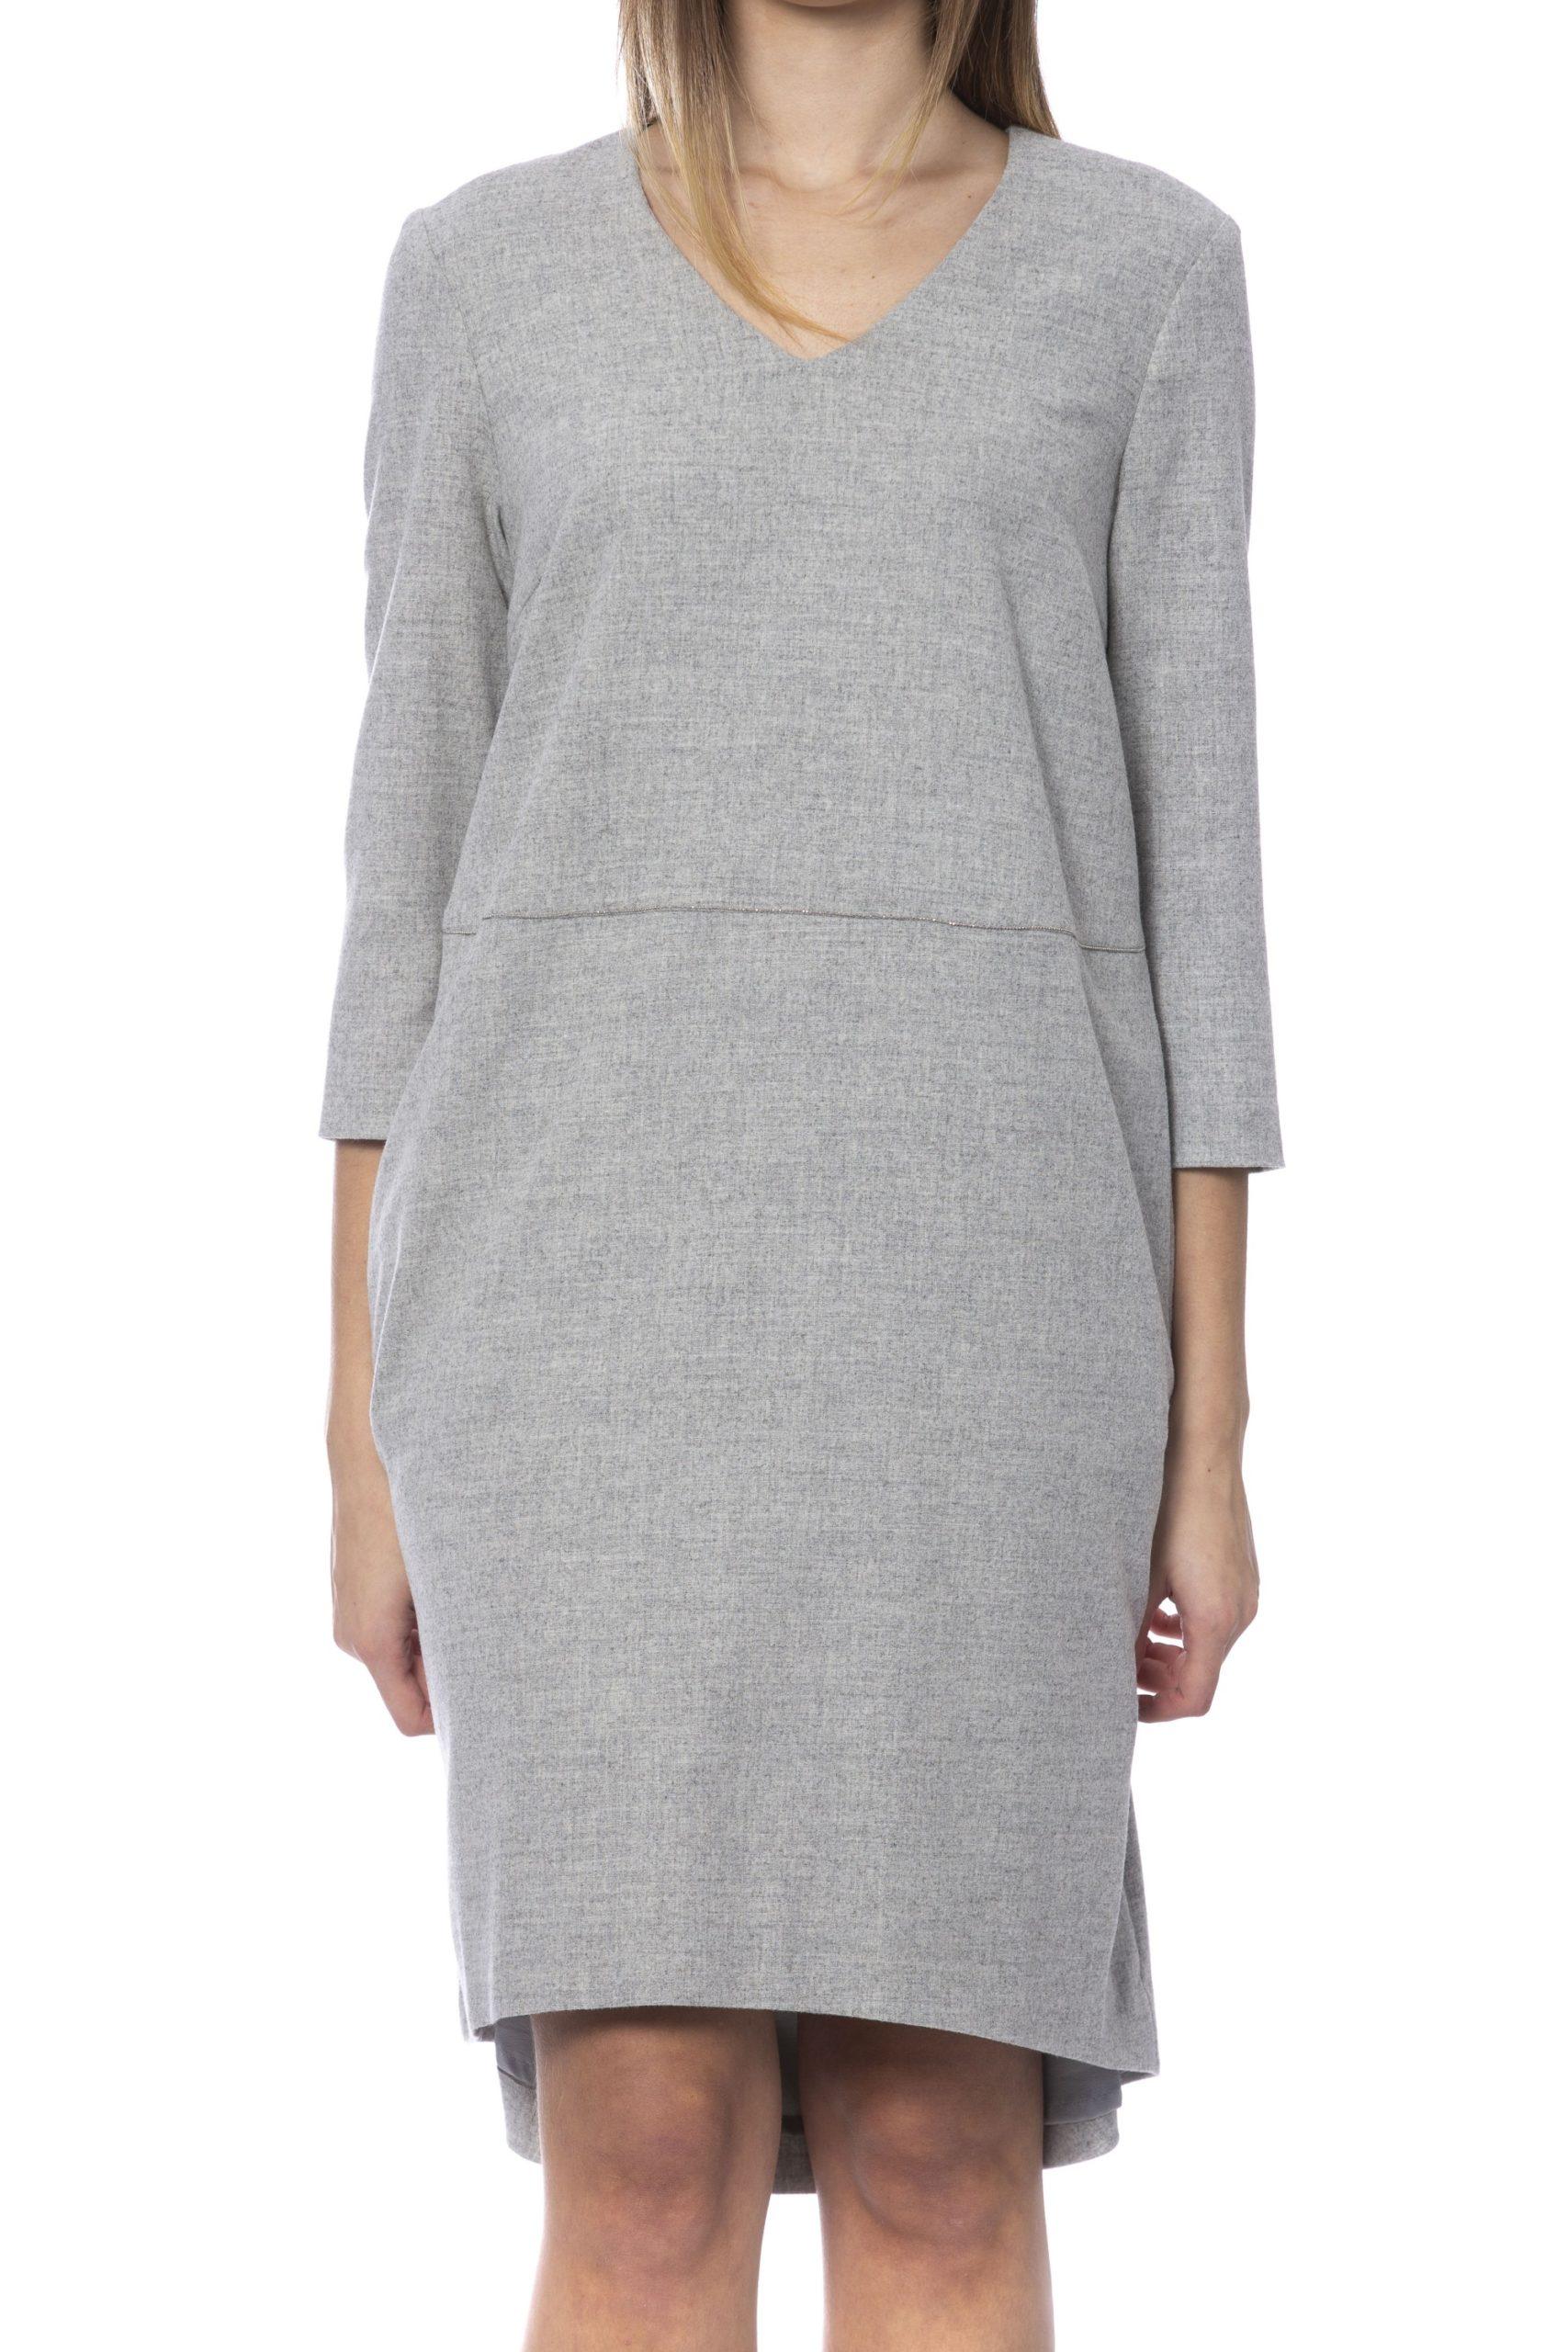 Peserico Women's Dress Grey PE993242 - IT42 | S